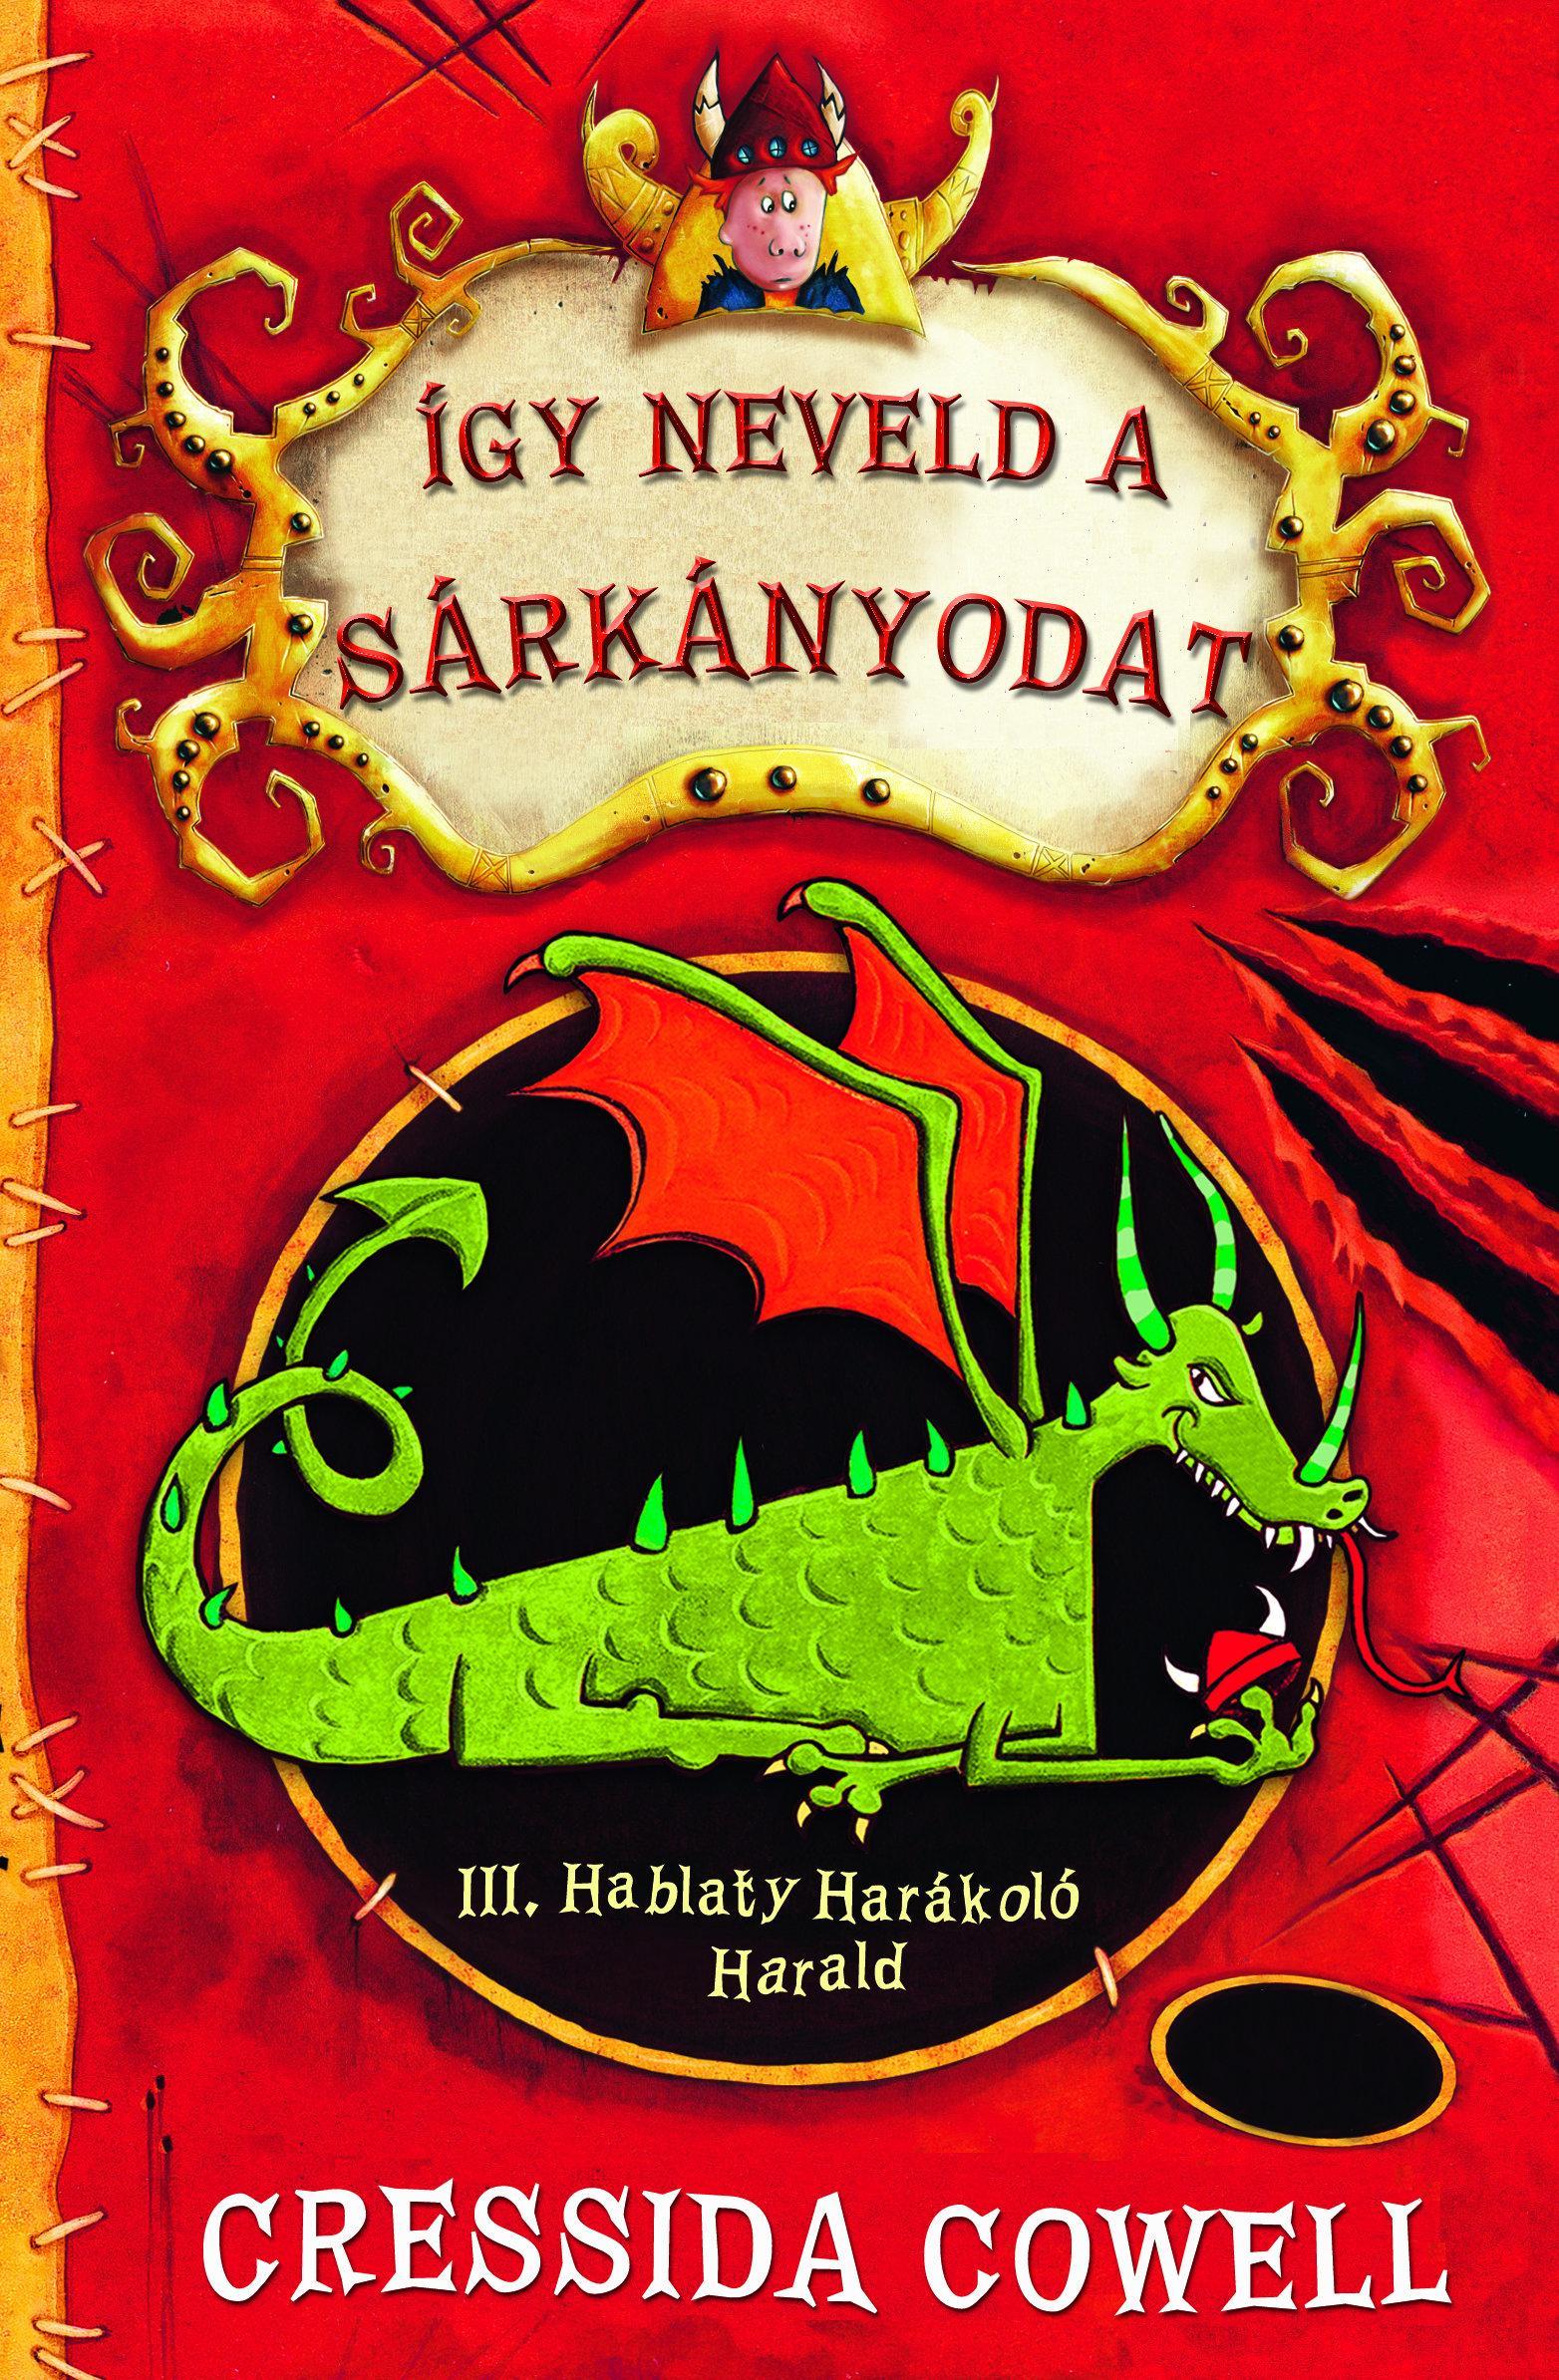 III. HABLATY HARÁKOLÓ HARALD - ÍGY NEVELD A SÁRKÁNYODAT 1.